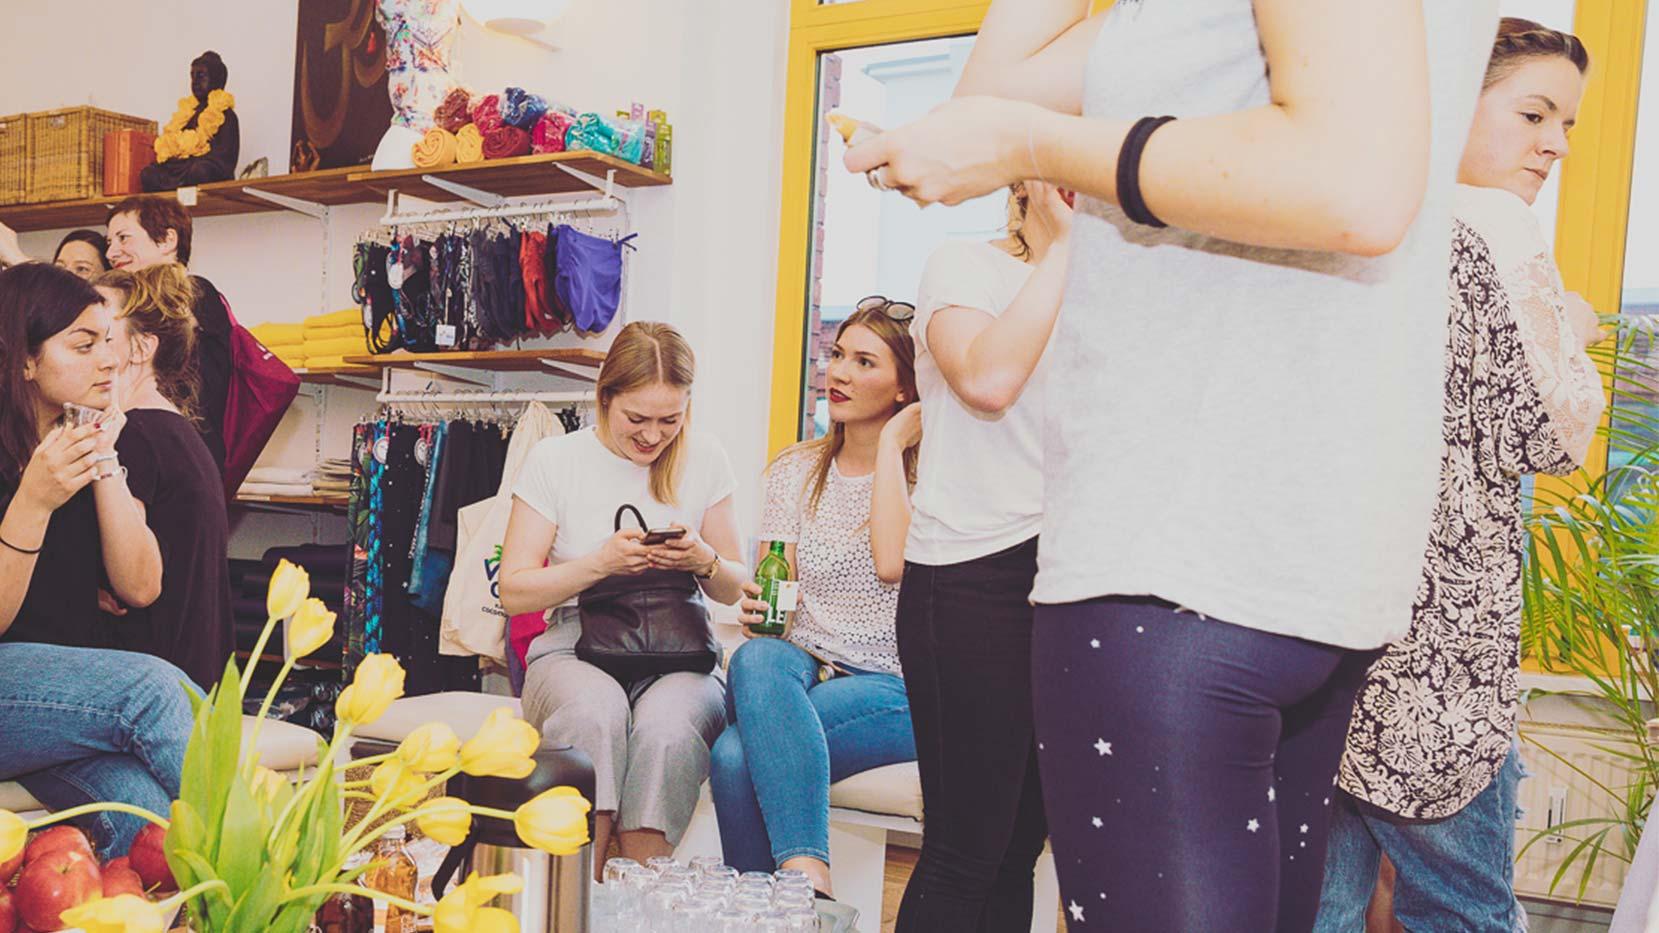 Yoga Event mit Zalando in Koop mit Jelena Lieberberg